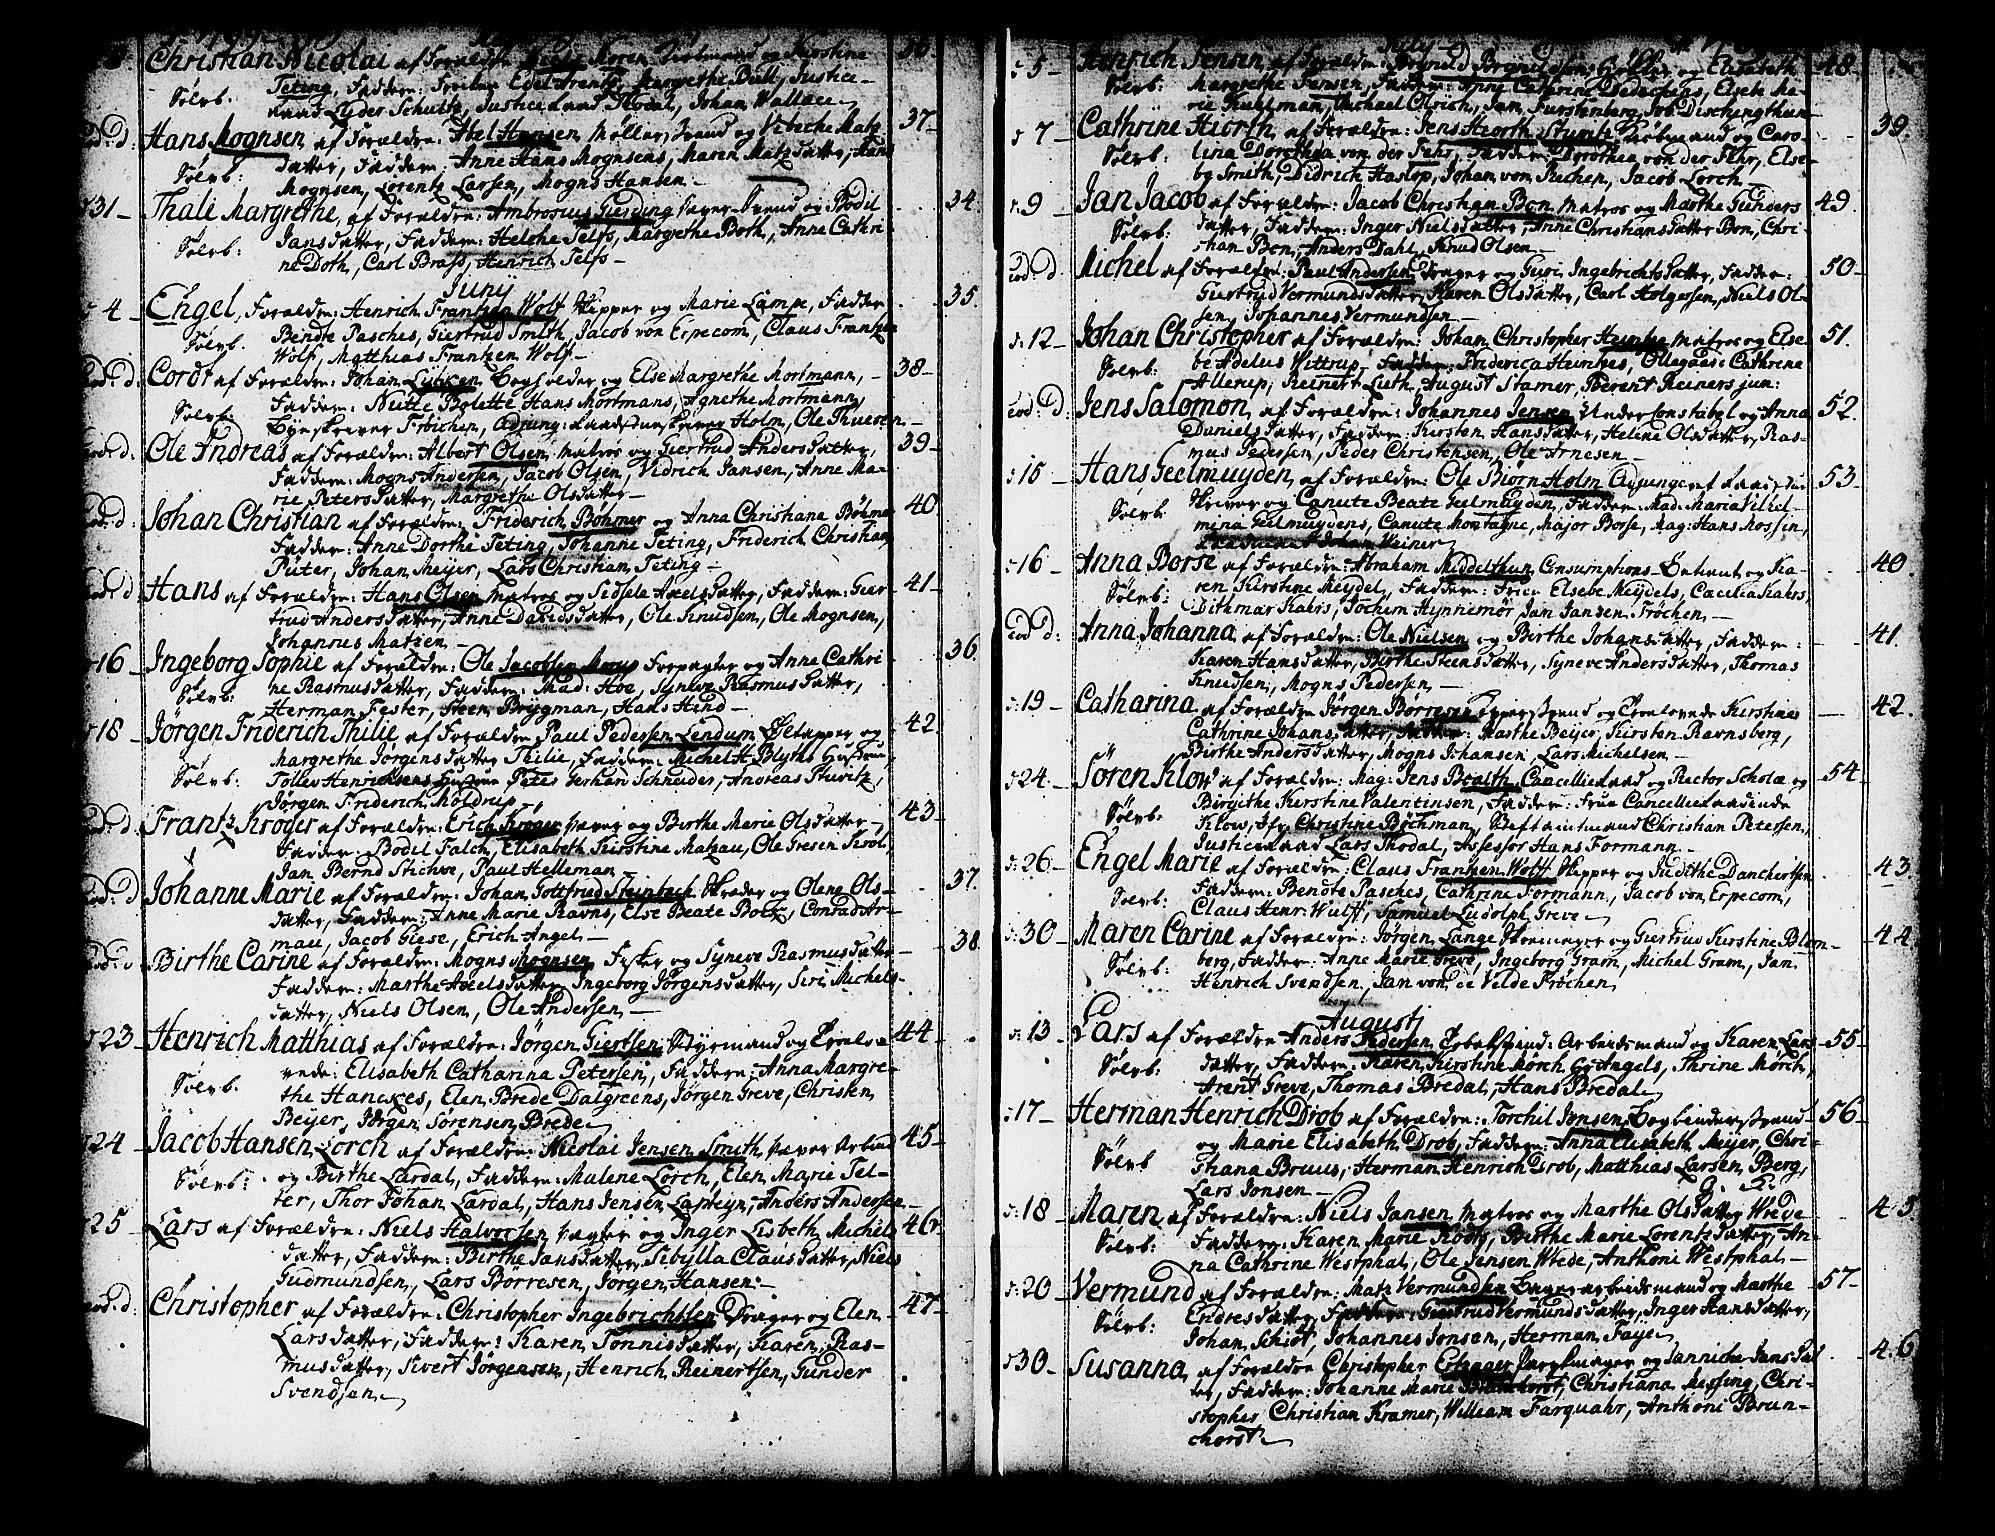 SAB, Domkirken sokneprestembete, H/Haa/L0003: Ministerialbok nr. A 3, 1758-1789, s. 134-135